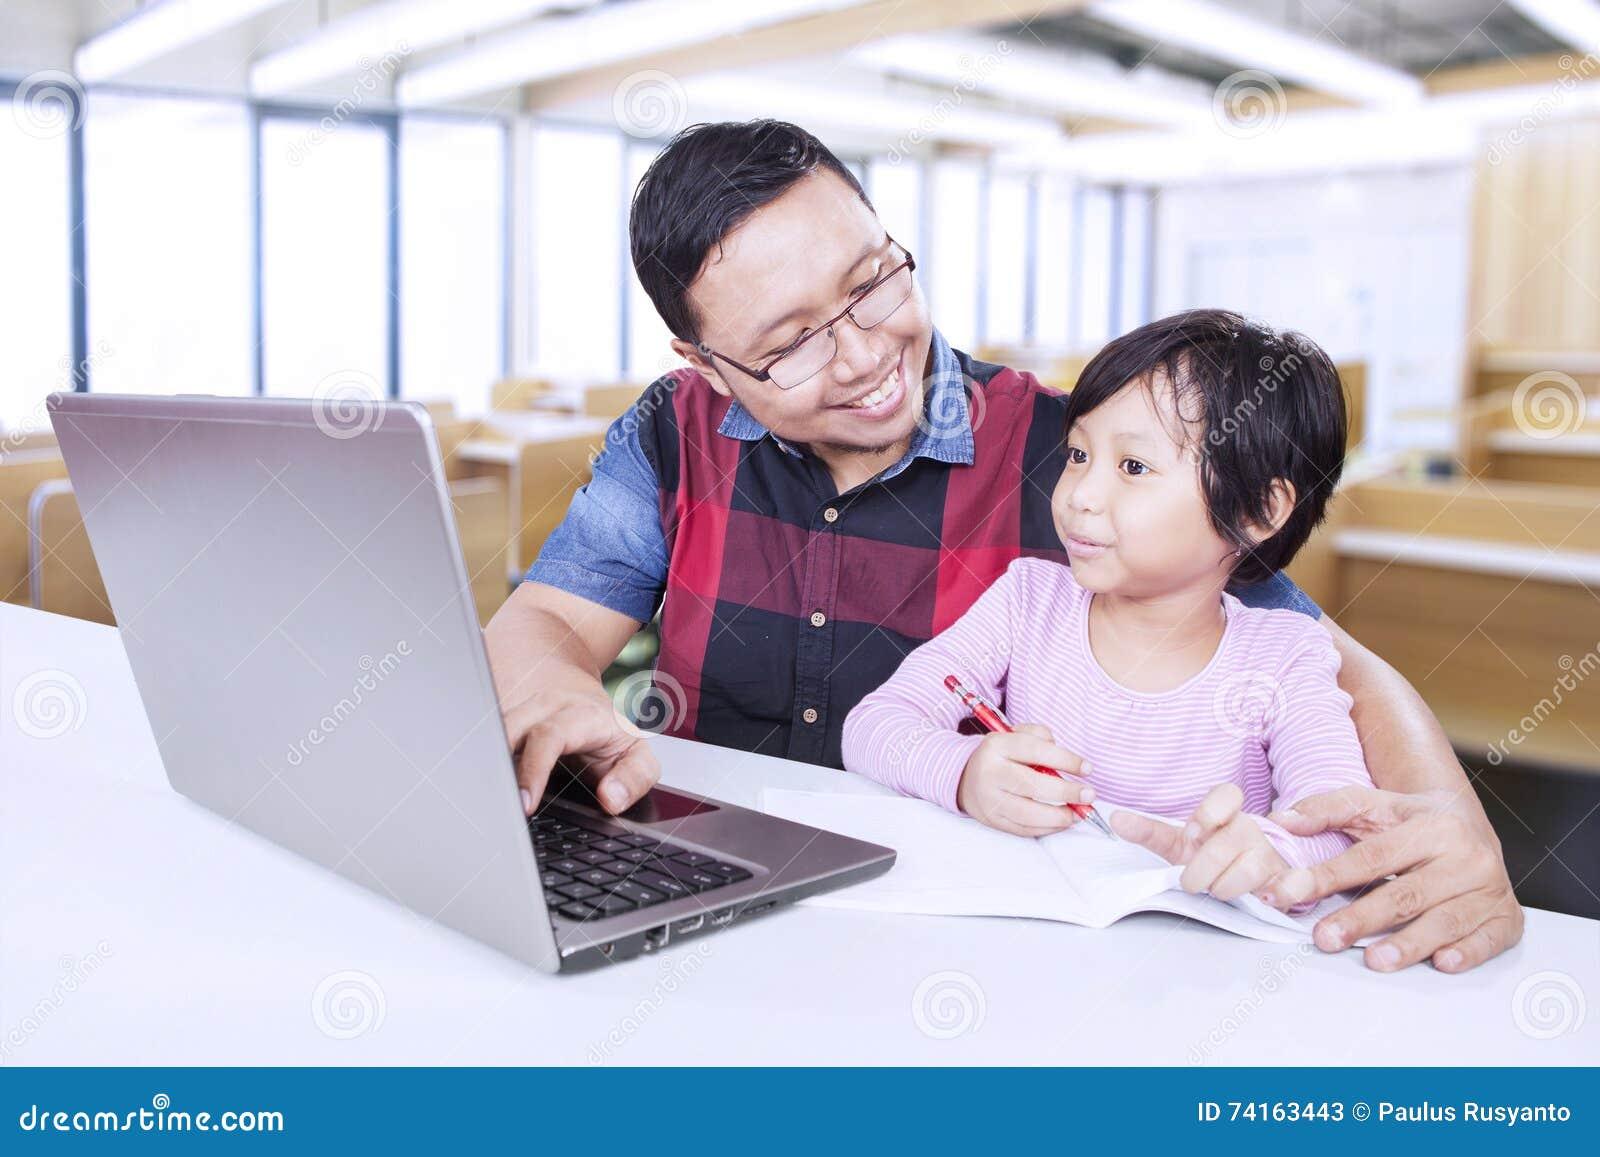 Lehrer Hilft Studentin Zu Studieren Stockbild - Bild von notizbuch ...